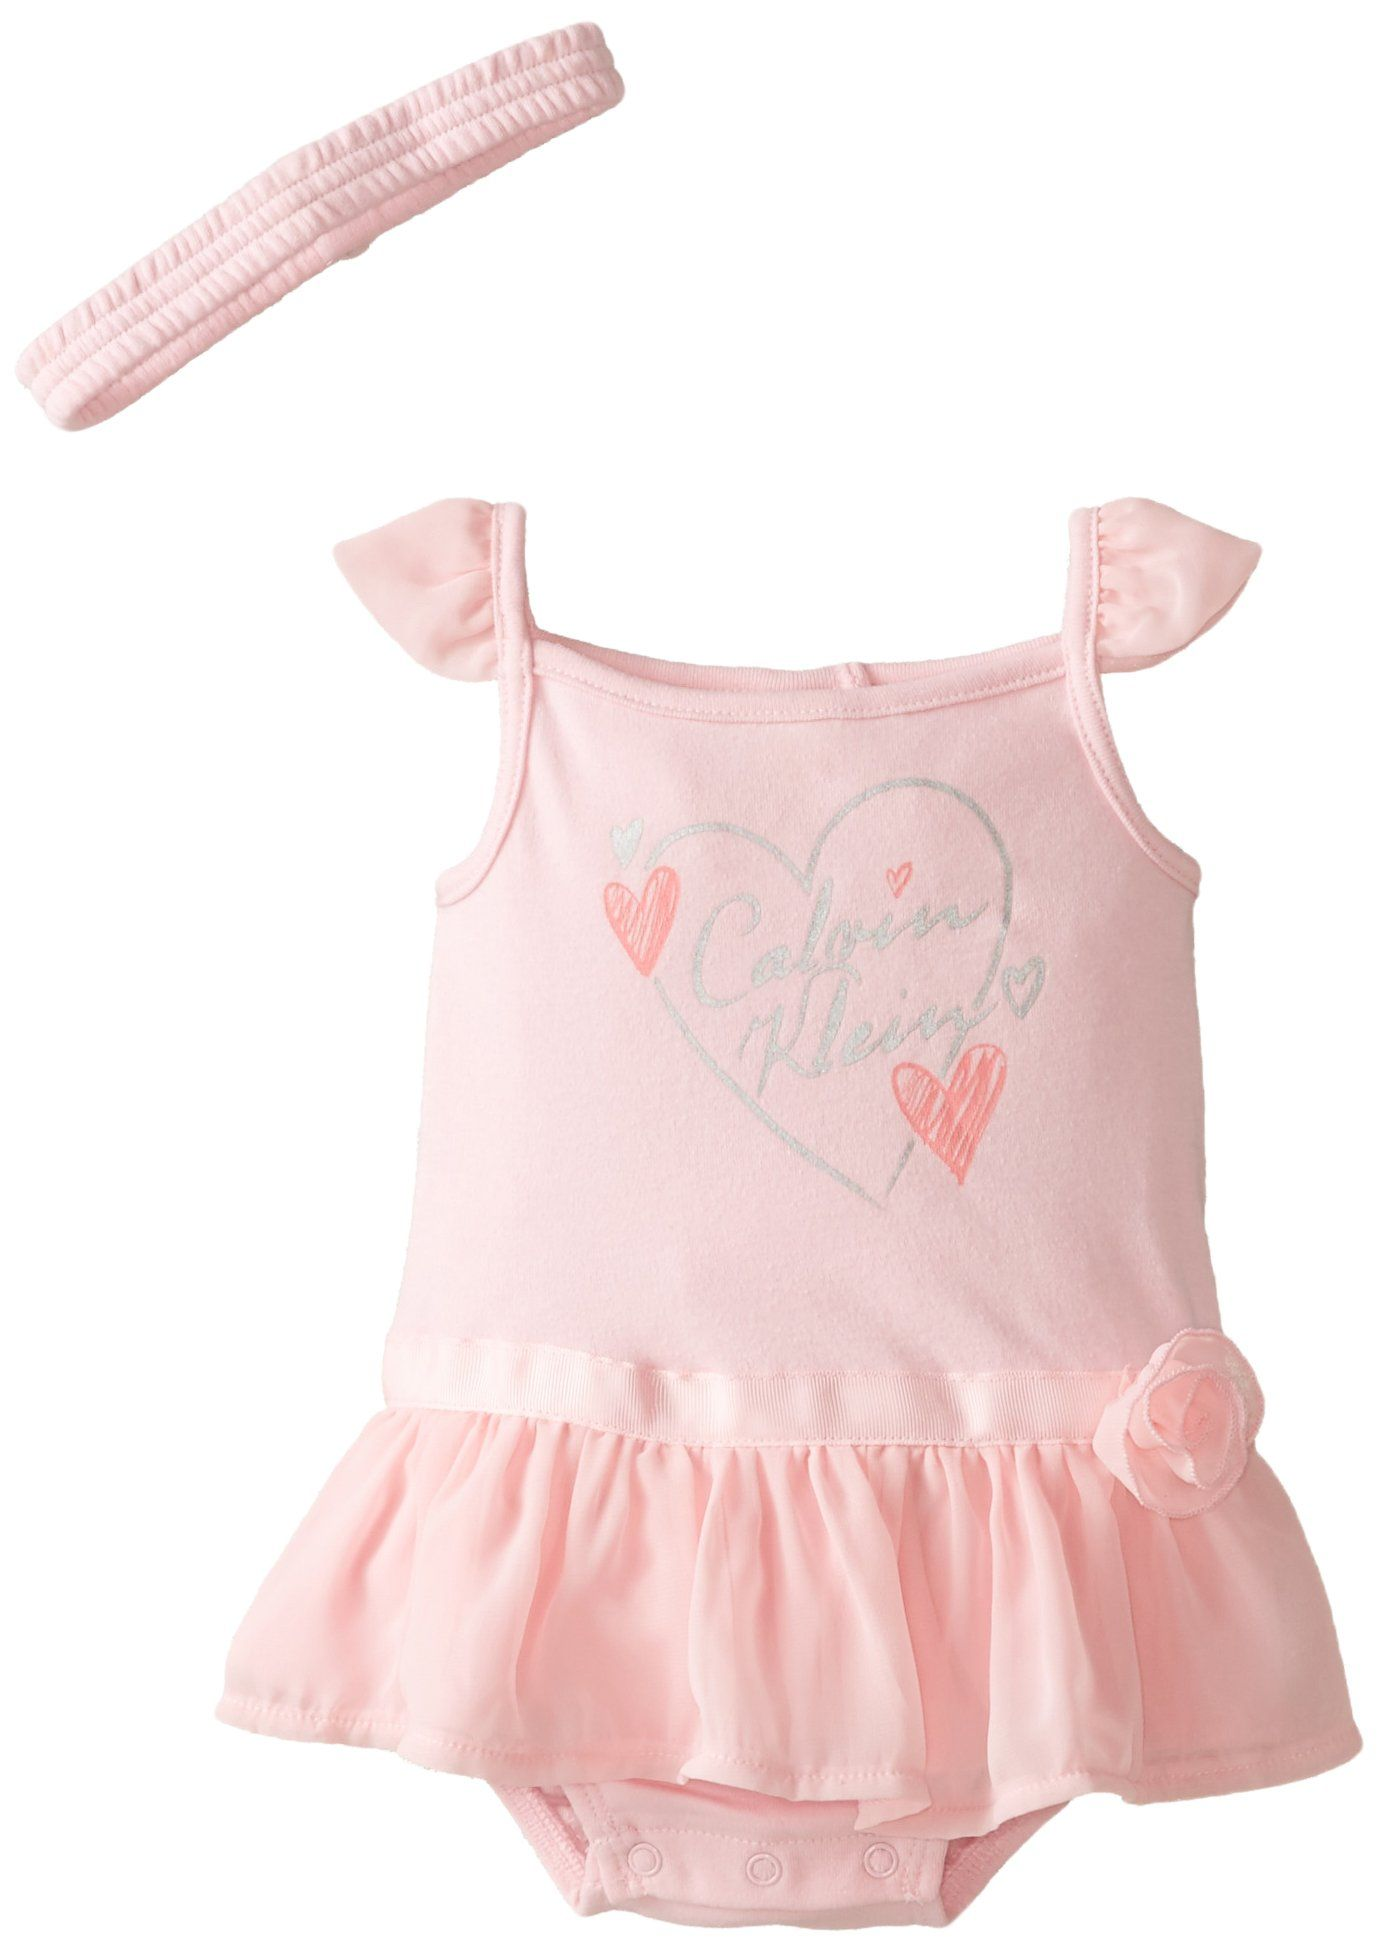 Calvin Klein Baby Girls Newborn Sunsuit and Headband Pink 0 3